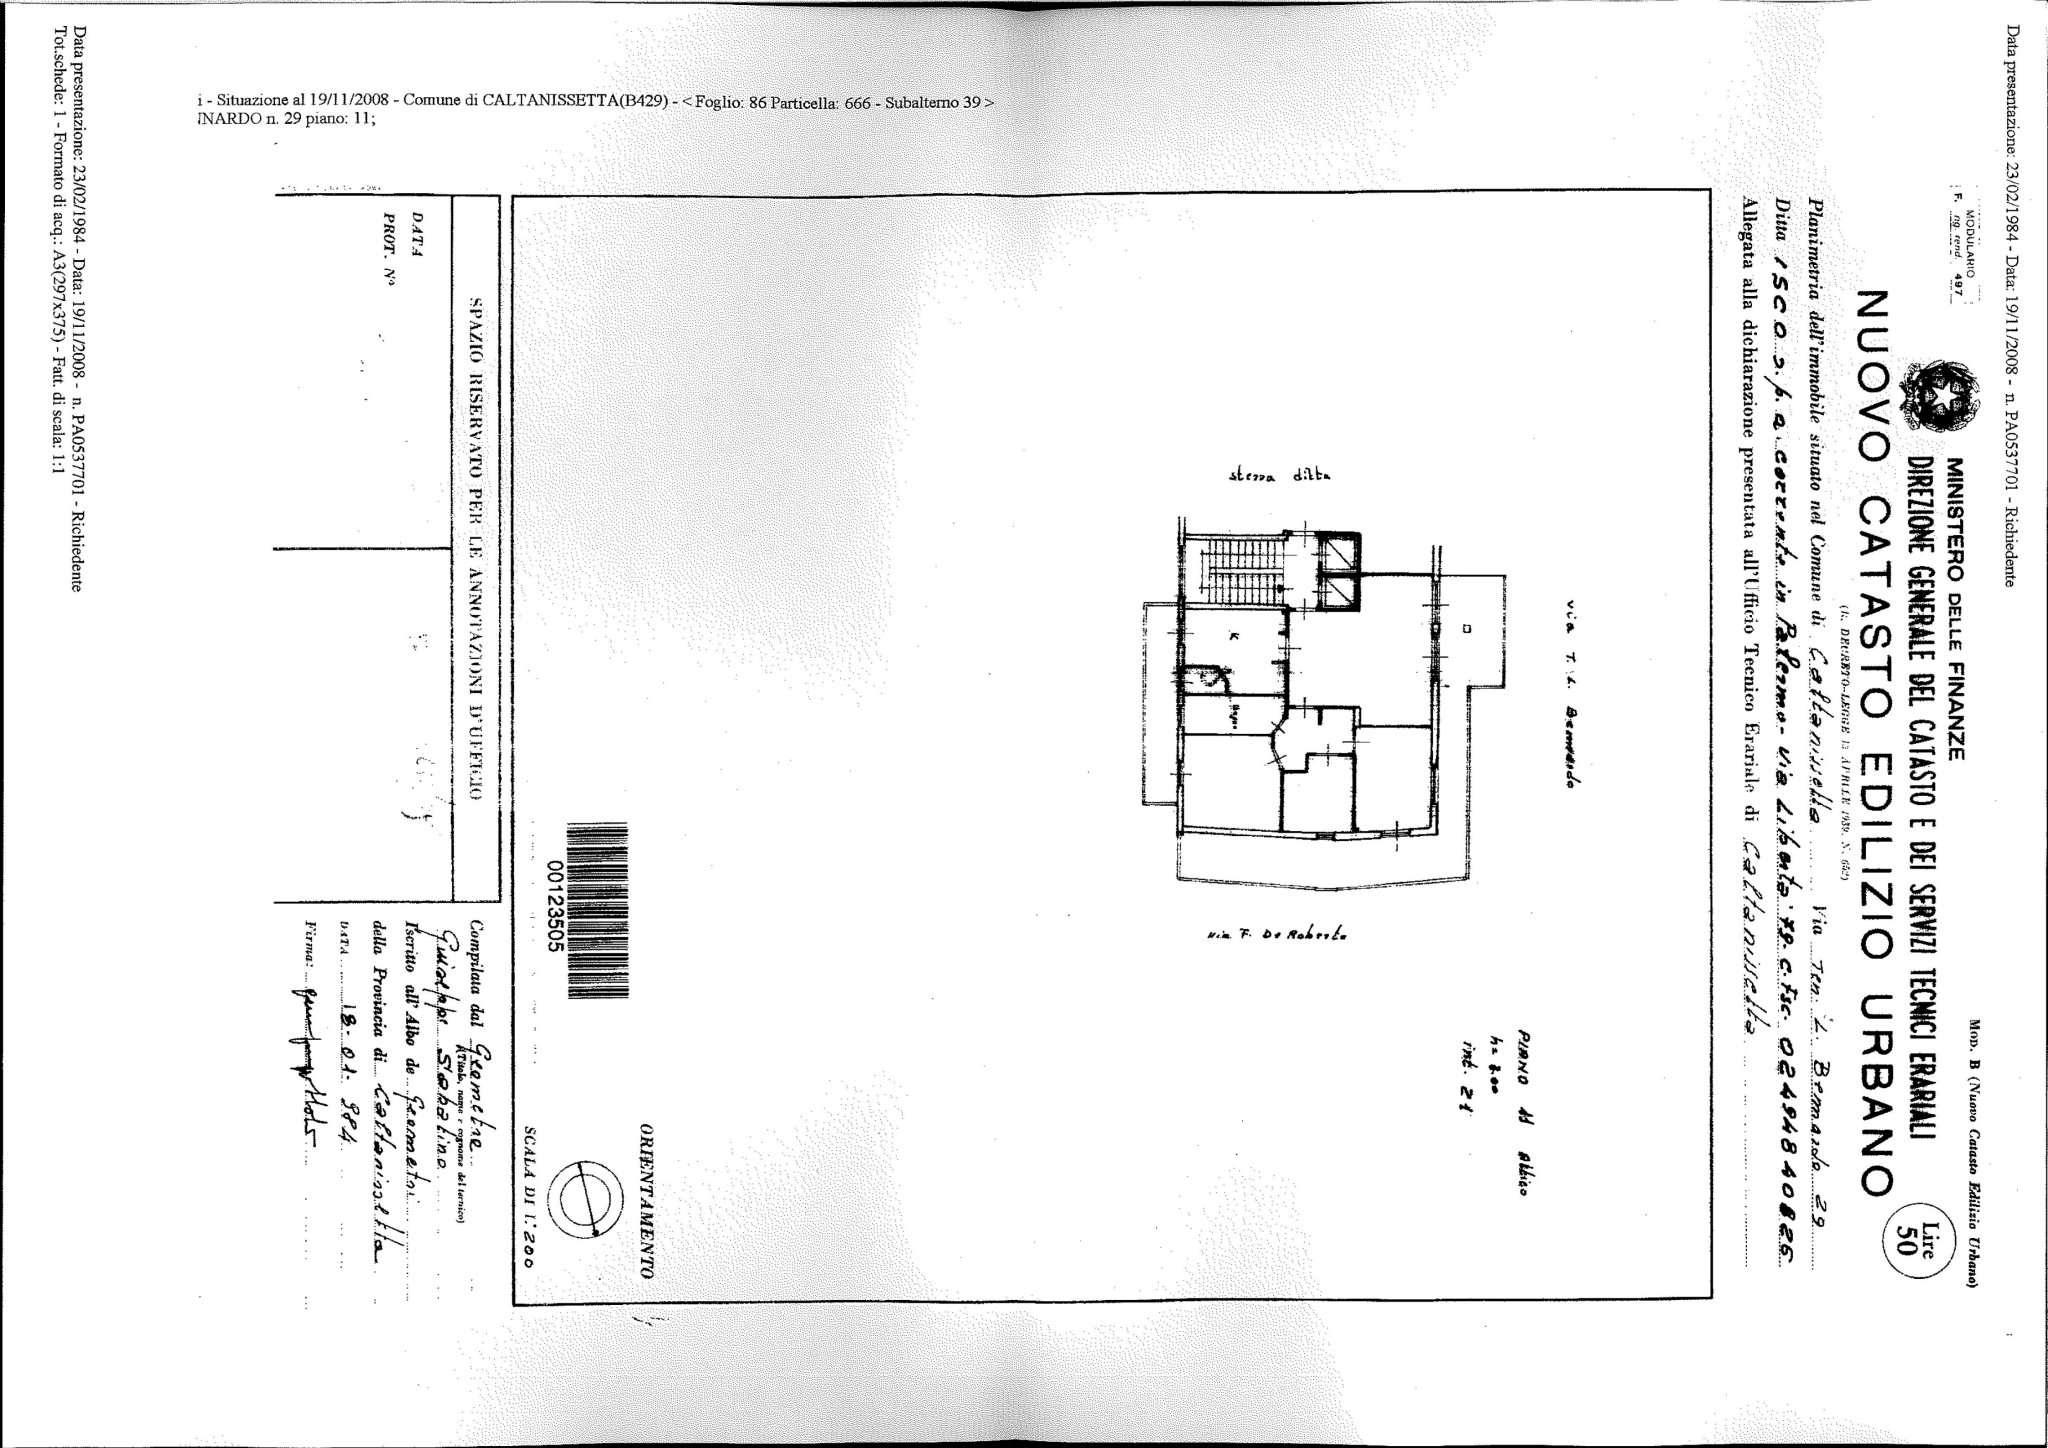 Appartamento quadrilocale in vendita a Caltanissetta (CL)